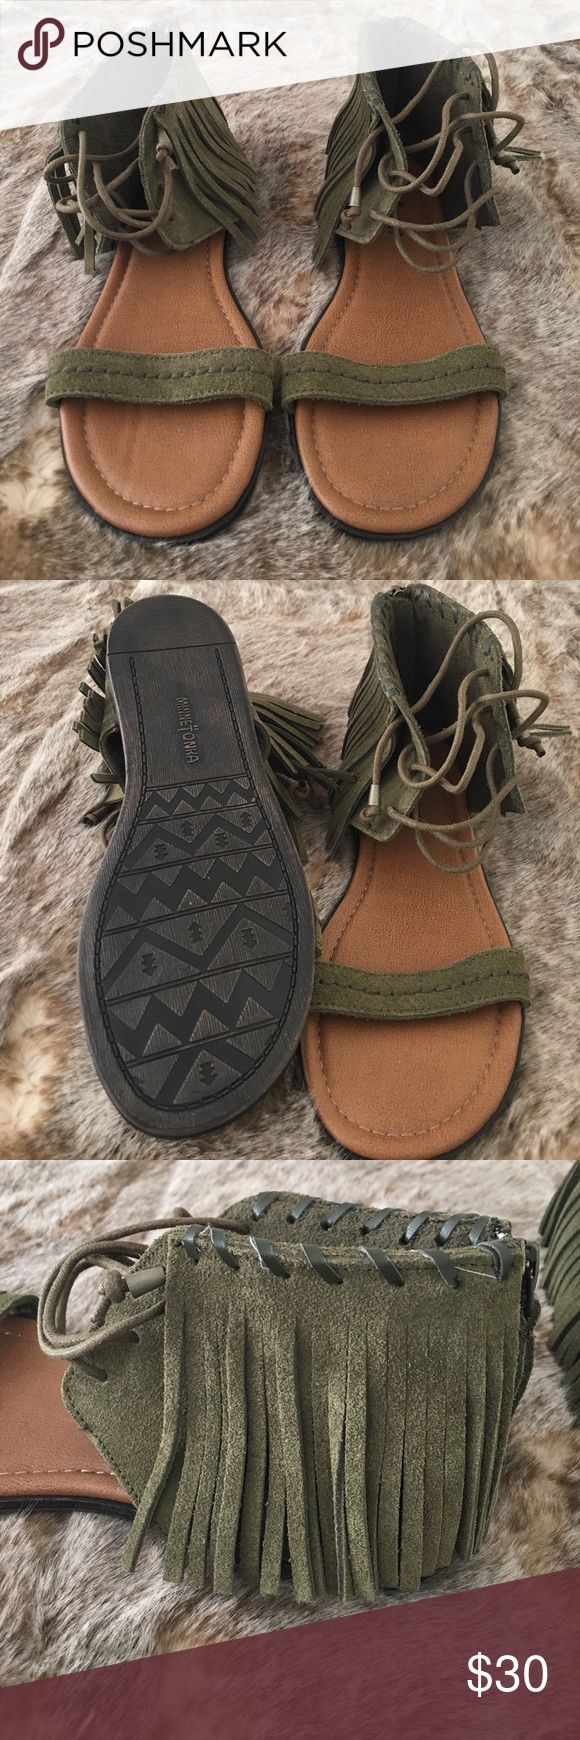 Minnetonka Olive Green Leather Gladiator Sandals New without box. Never Worn. Minnetonka Brand. Women's size 6, Medium. Fringe on outside & laces up. Zipper on back. Genuine Leather. Gladiator Style. Minnetonka Shoes Sandals